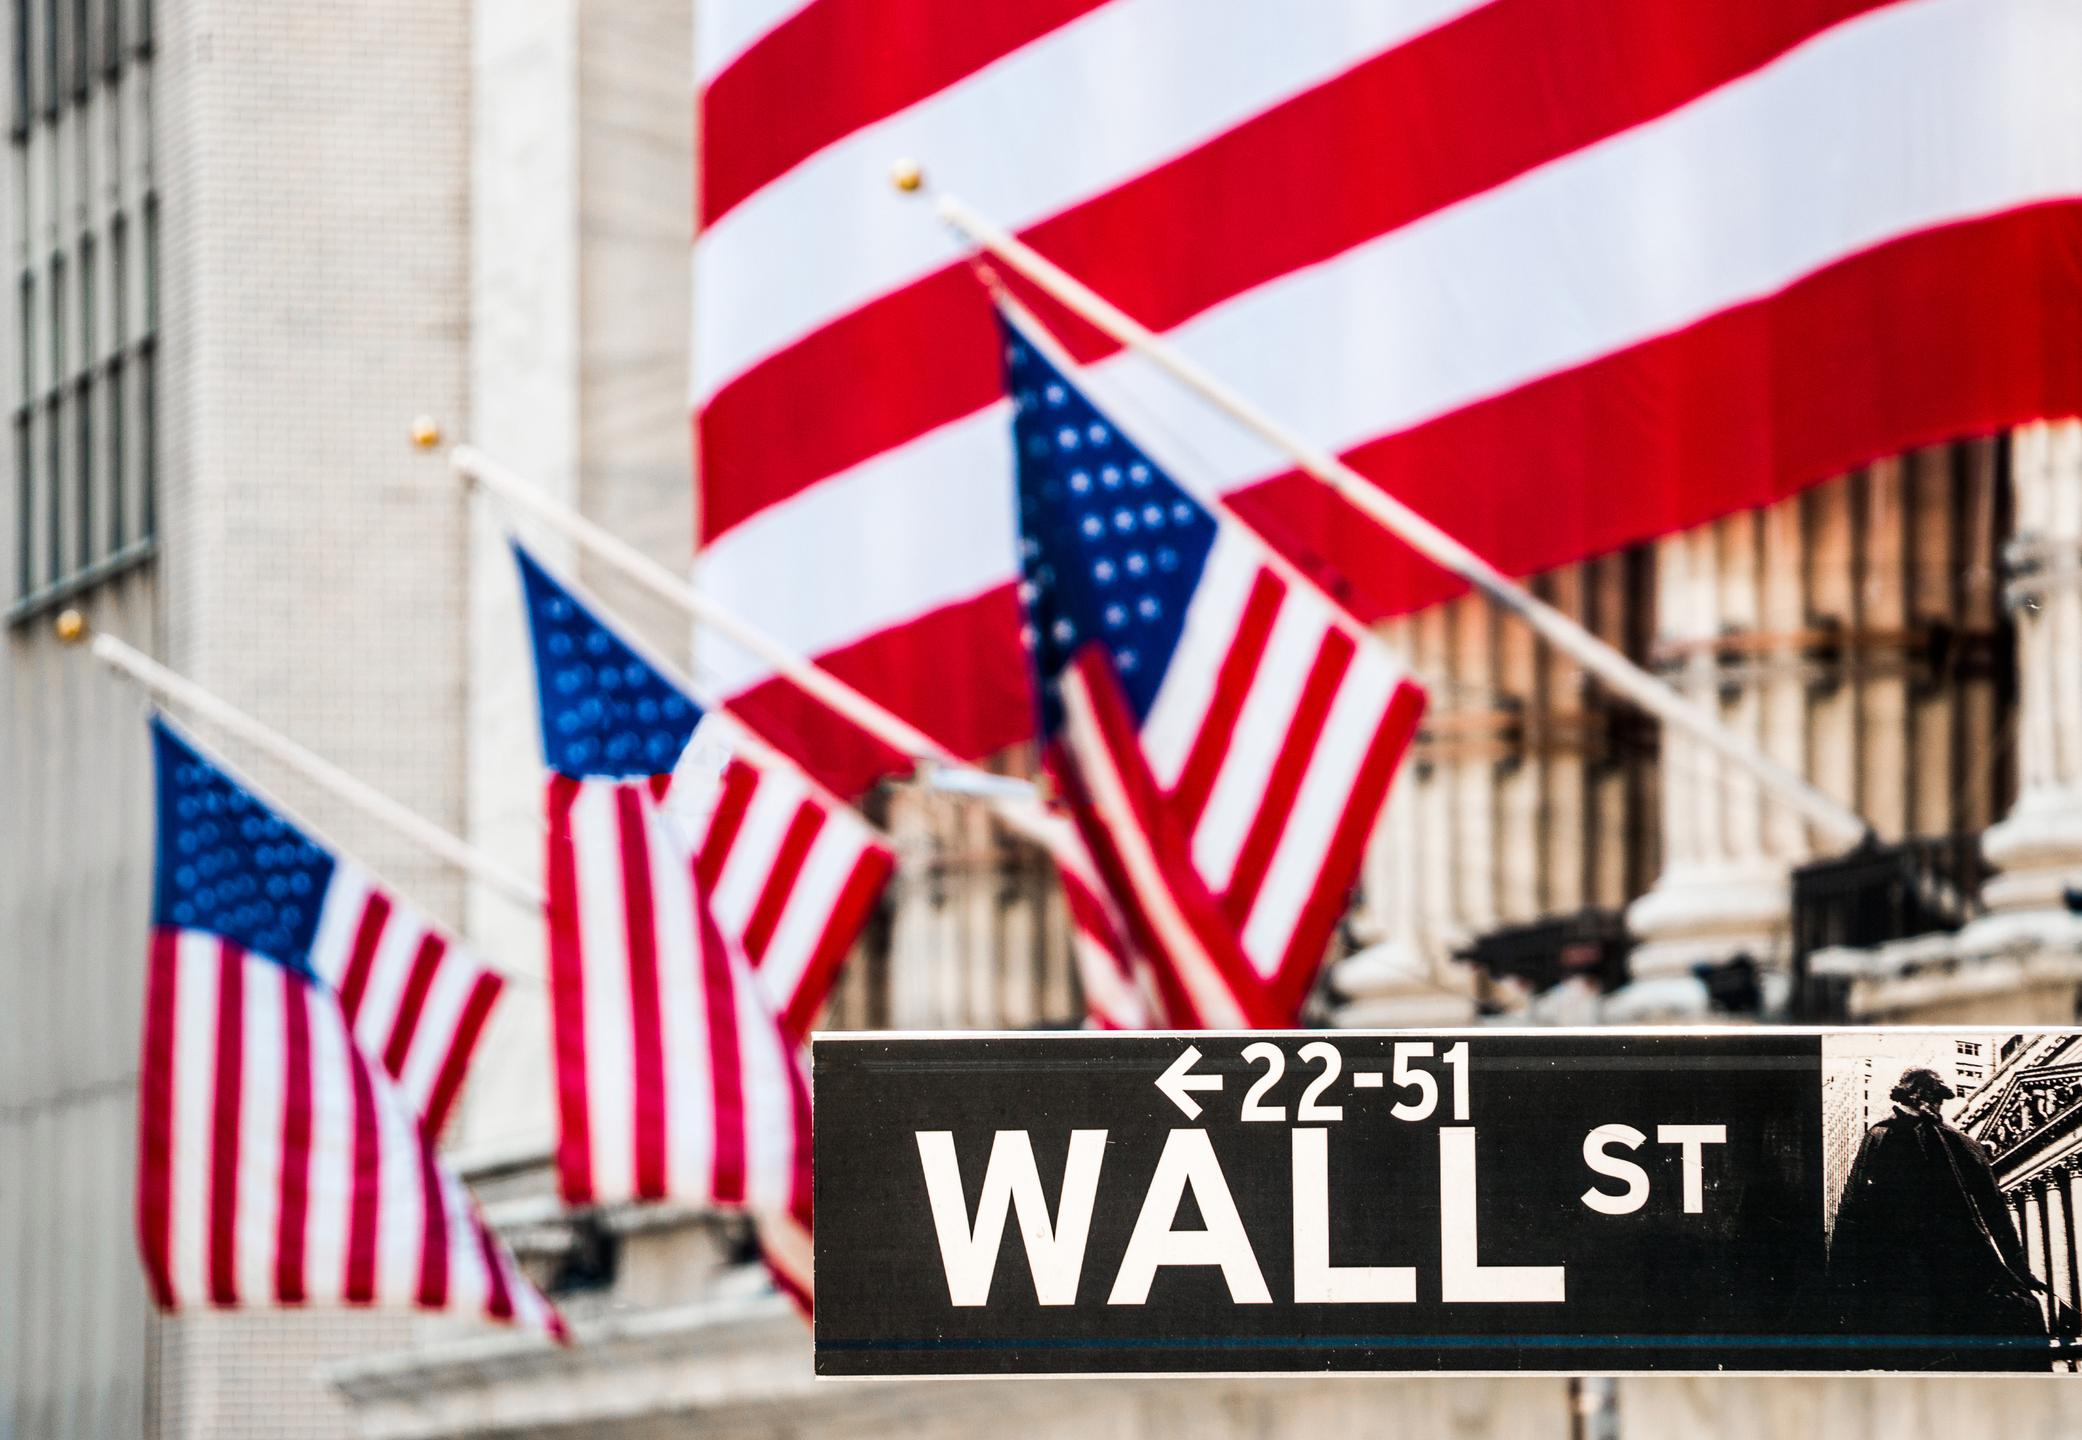 3 Marijuana Stocks Set to Uplist to the NYSE or Nasdaq in